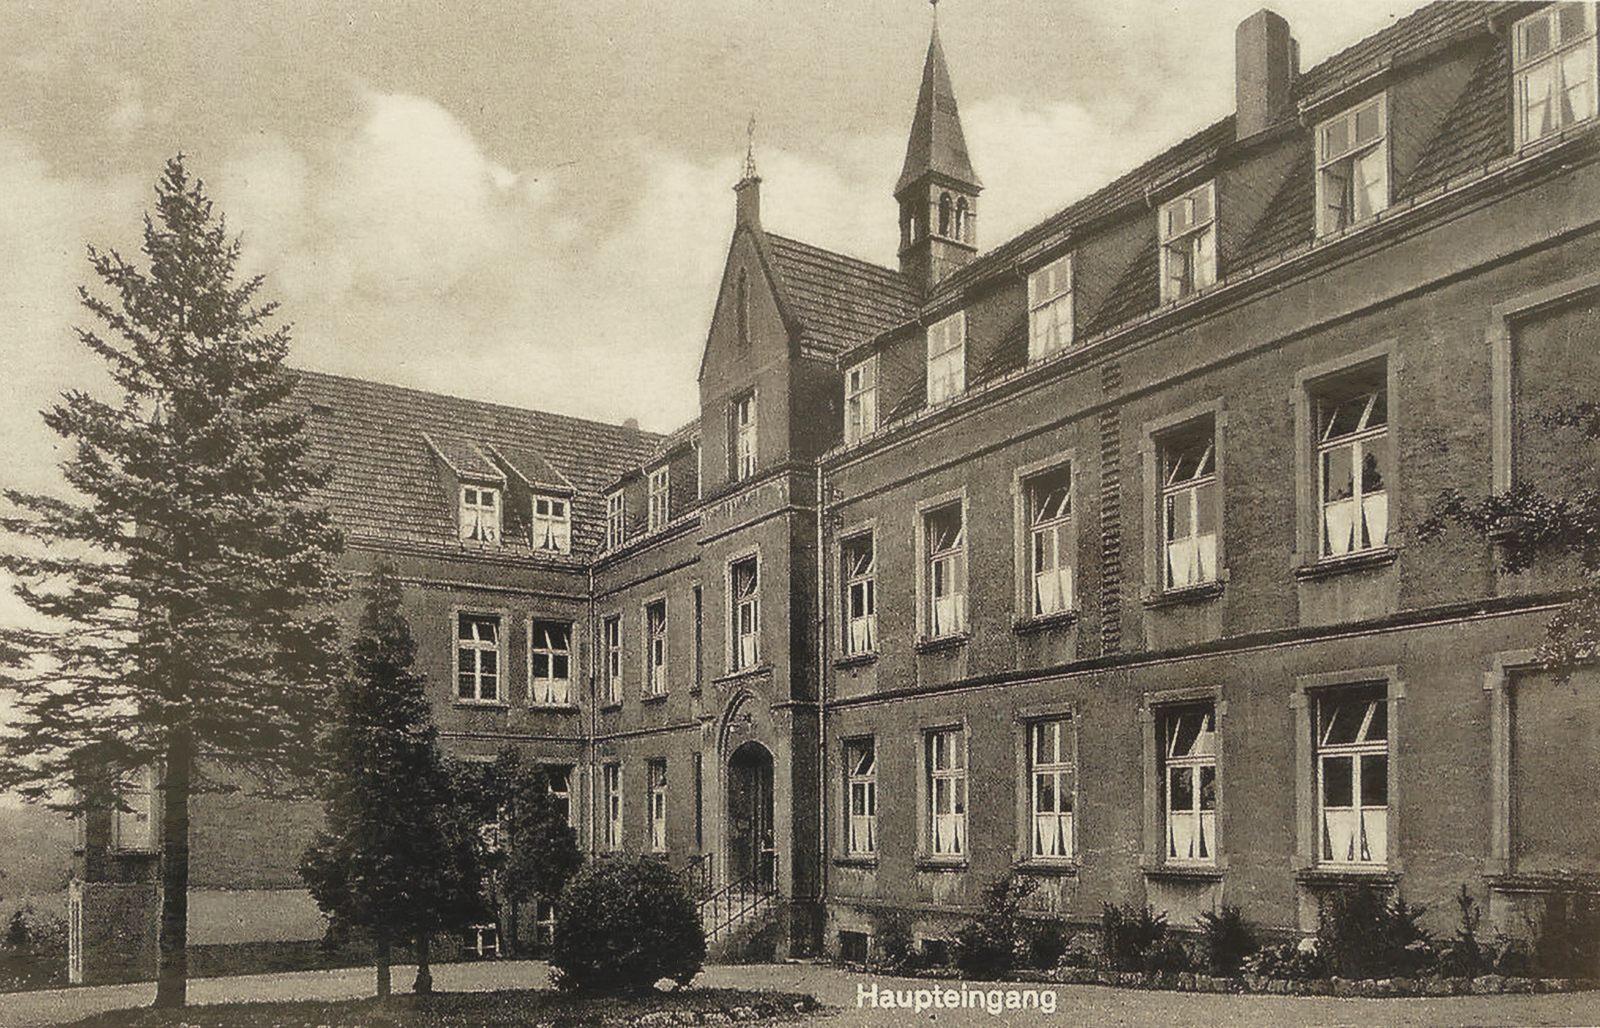 Krankenhaus in den 1930ern